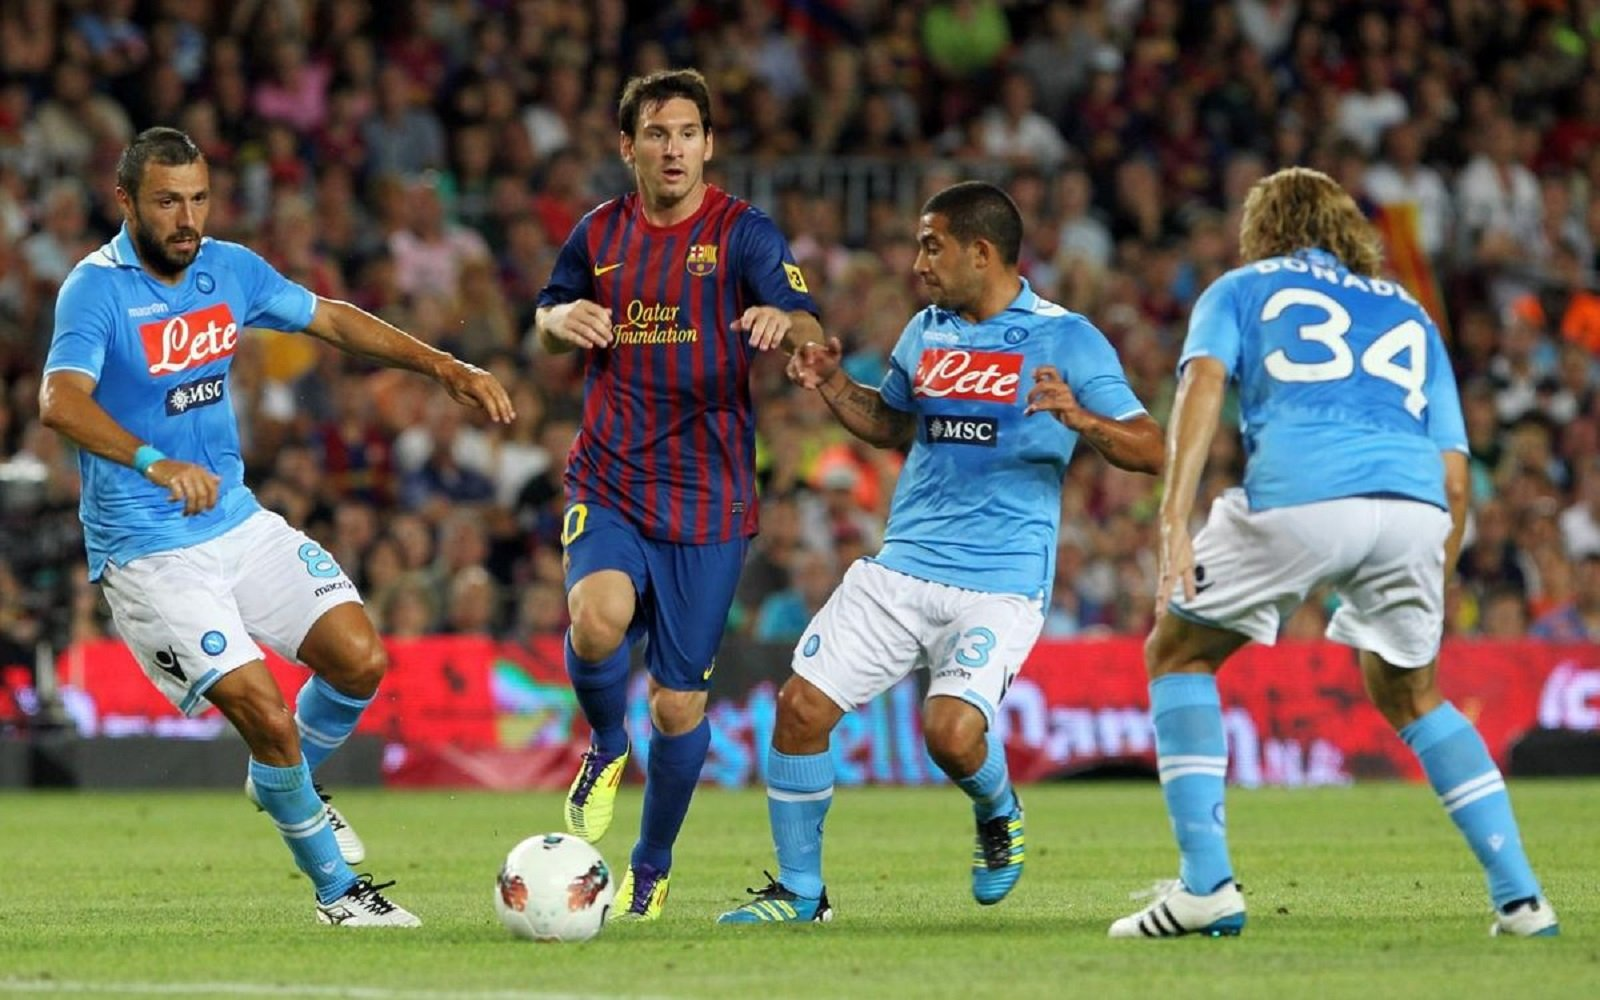 Messi Barça Nàpols FC Barcelona